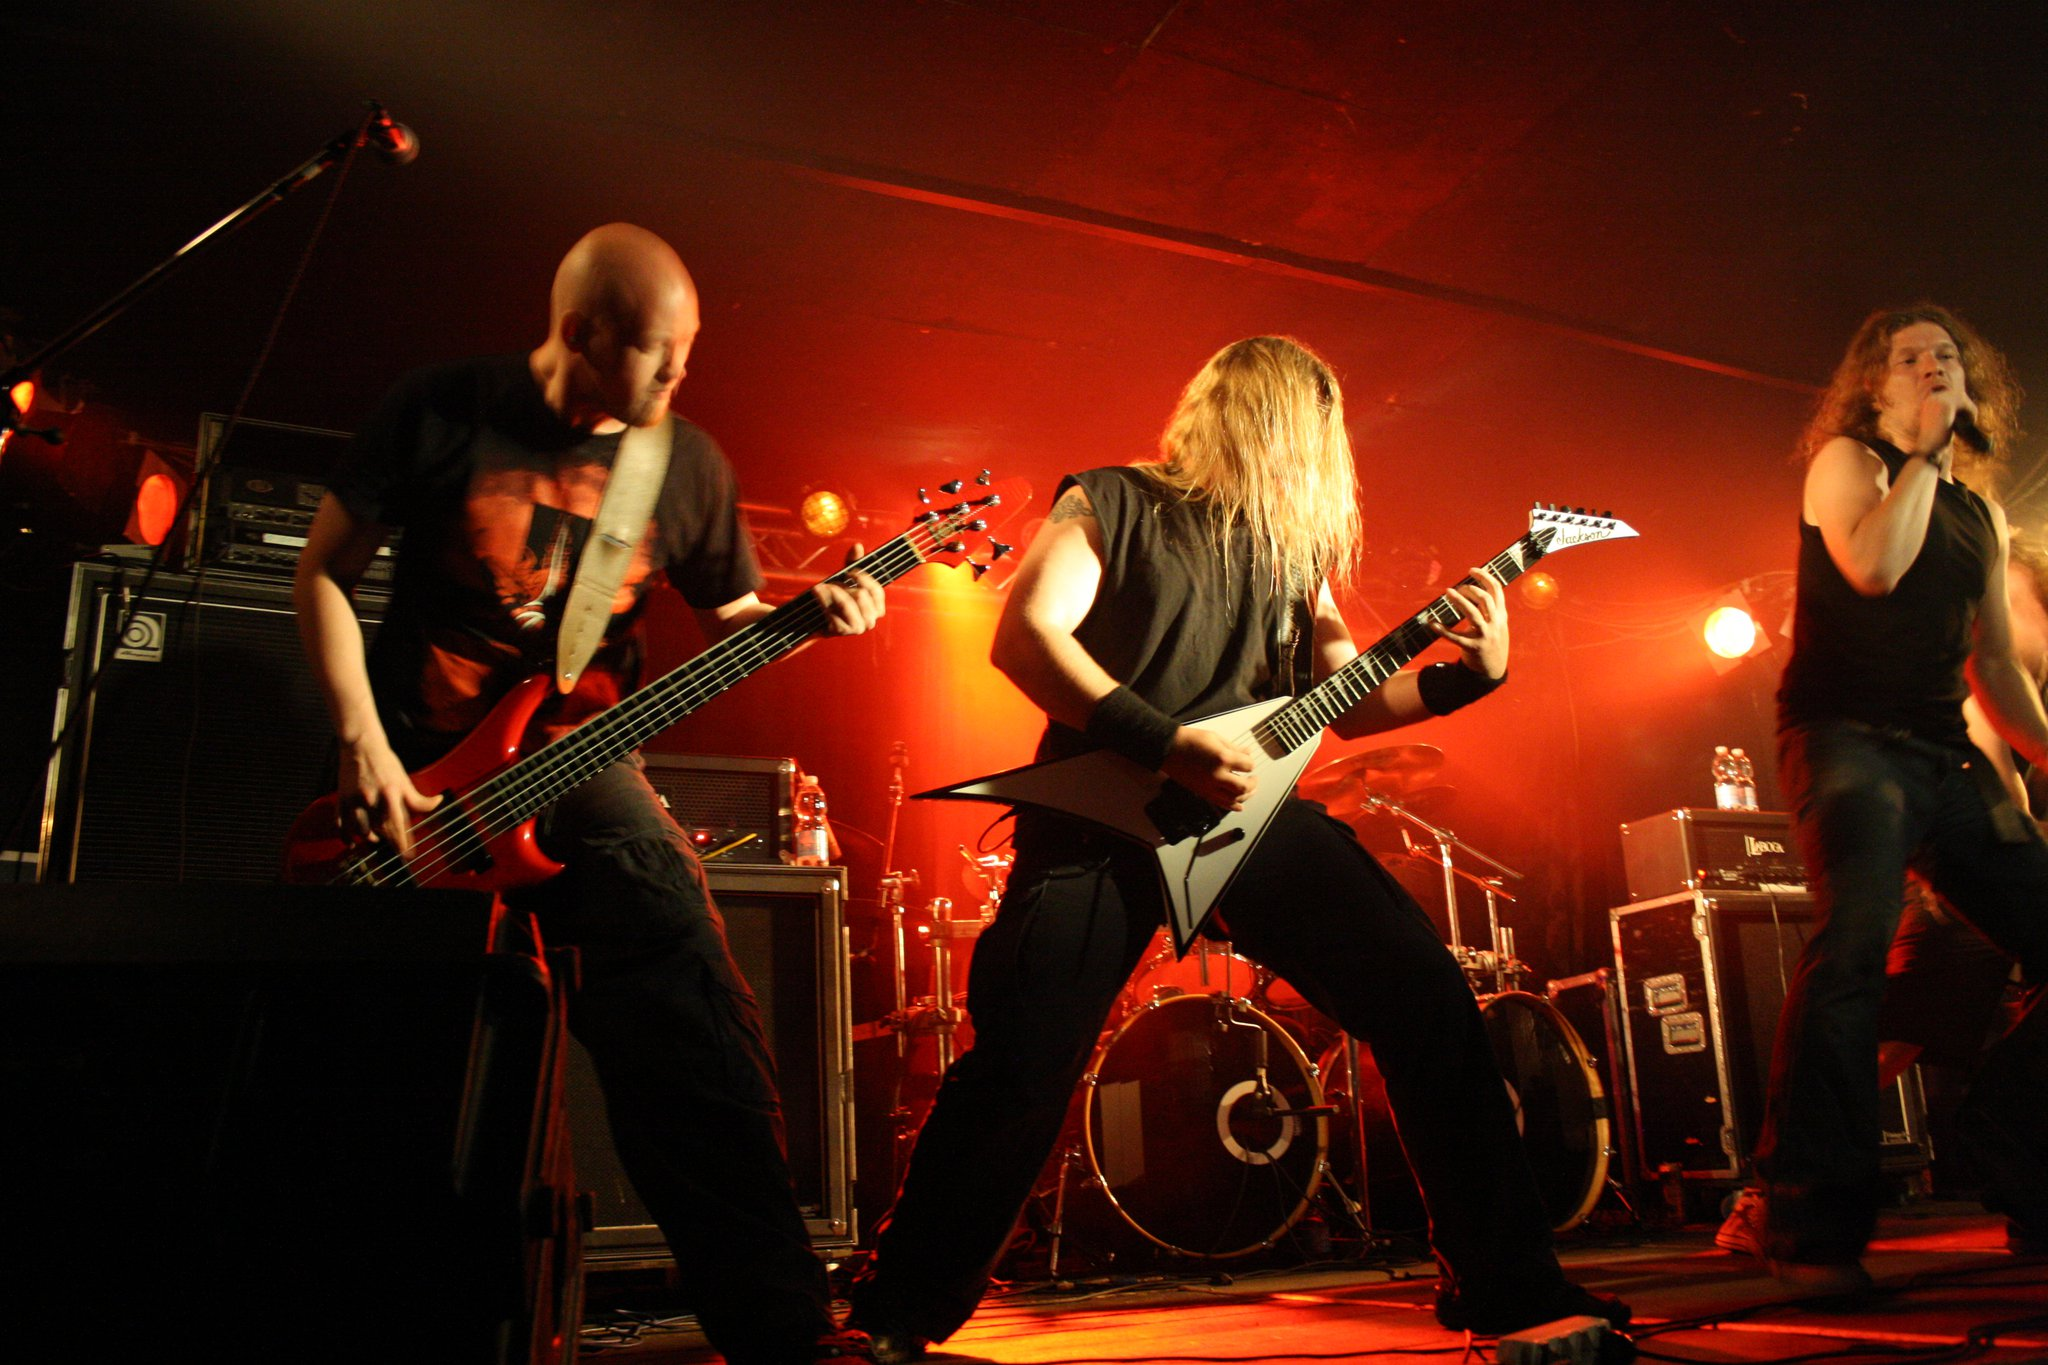 death metal band heavy - photo #25